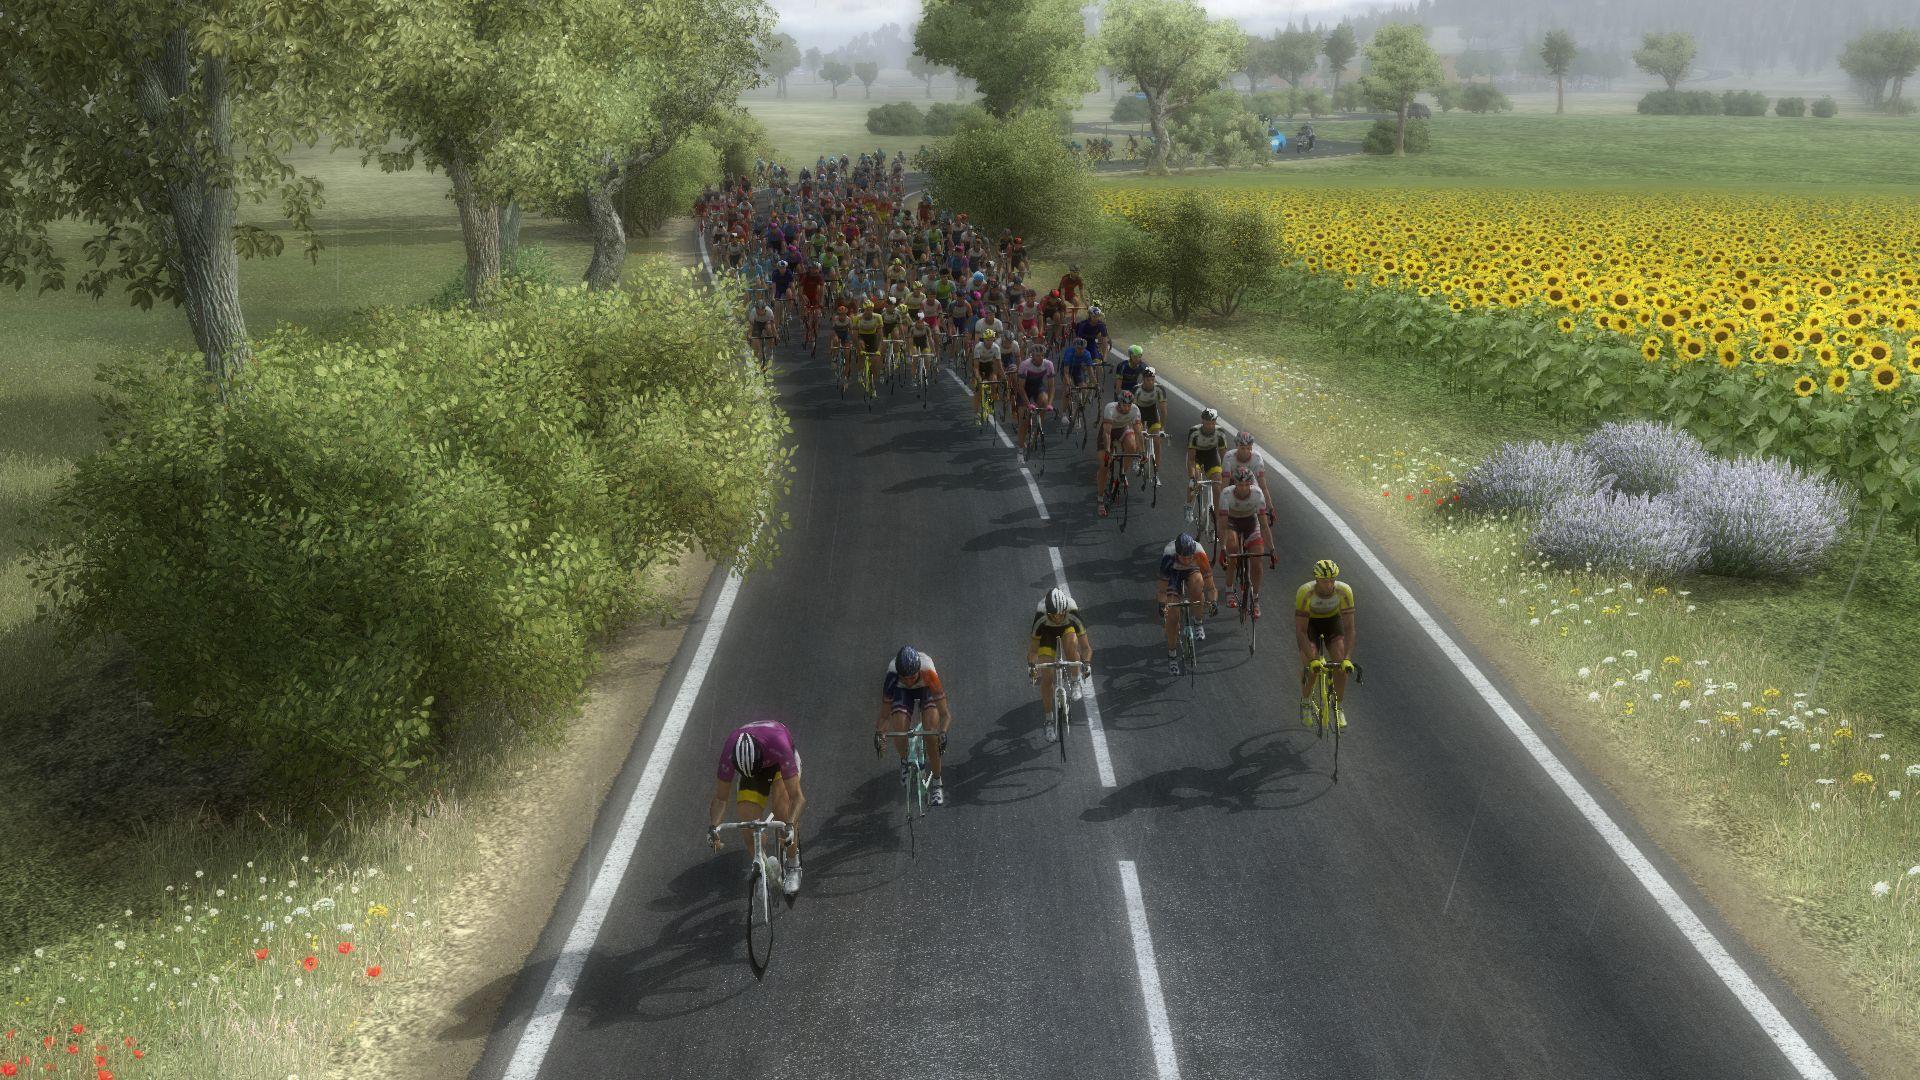 pcmdaily.com/images/mg/2020/Reports/GTM/Giro/S12/mg20_giro_s12_29.jpg